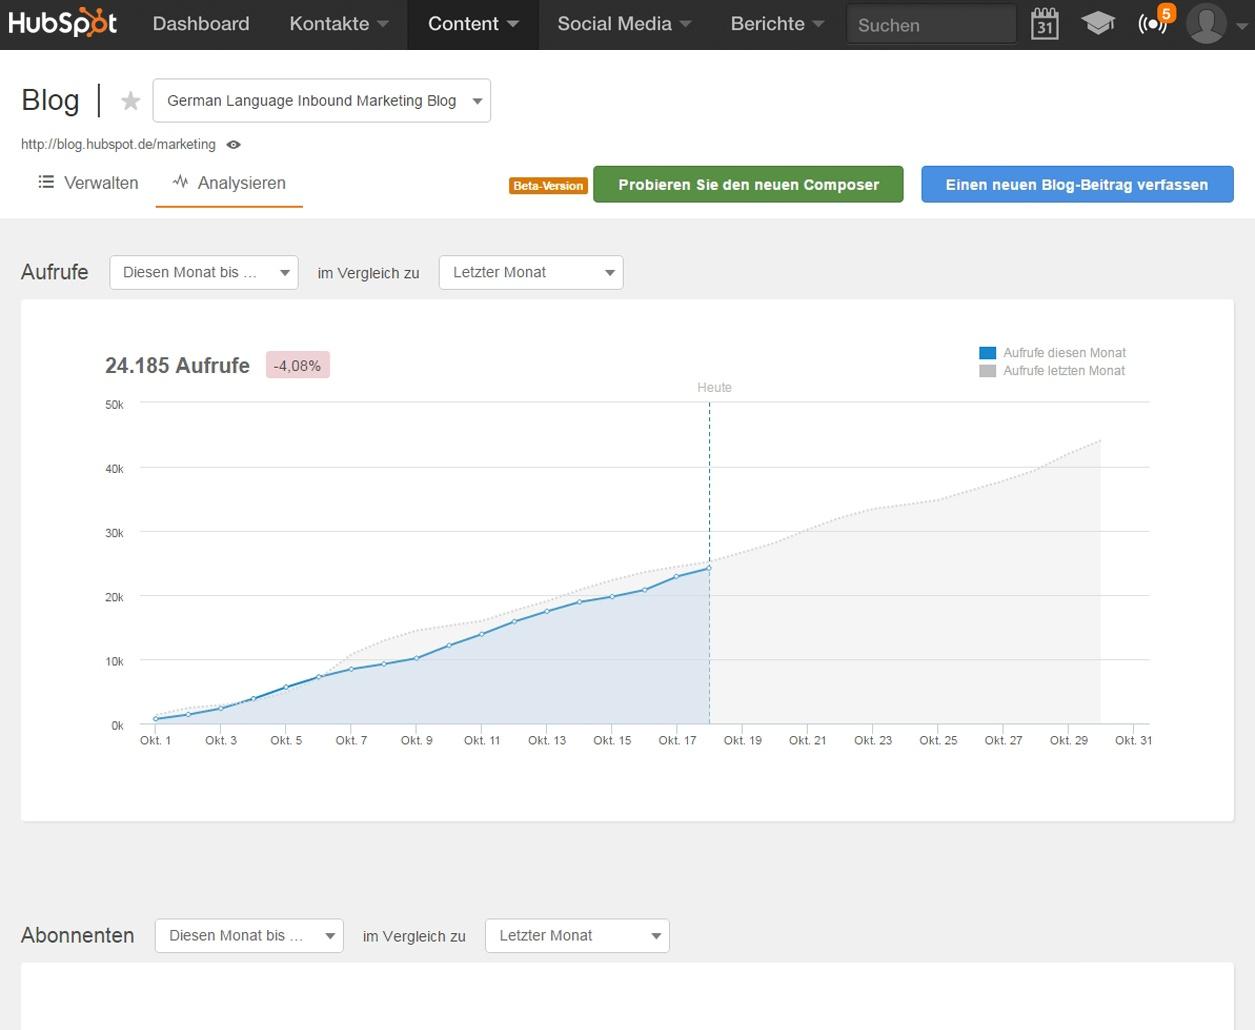 Blog Analytics in HubSpot